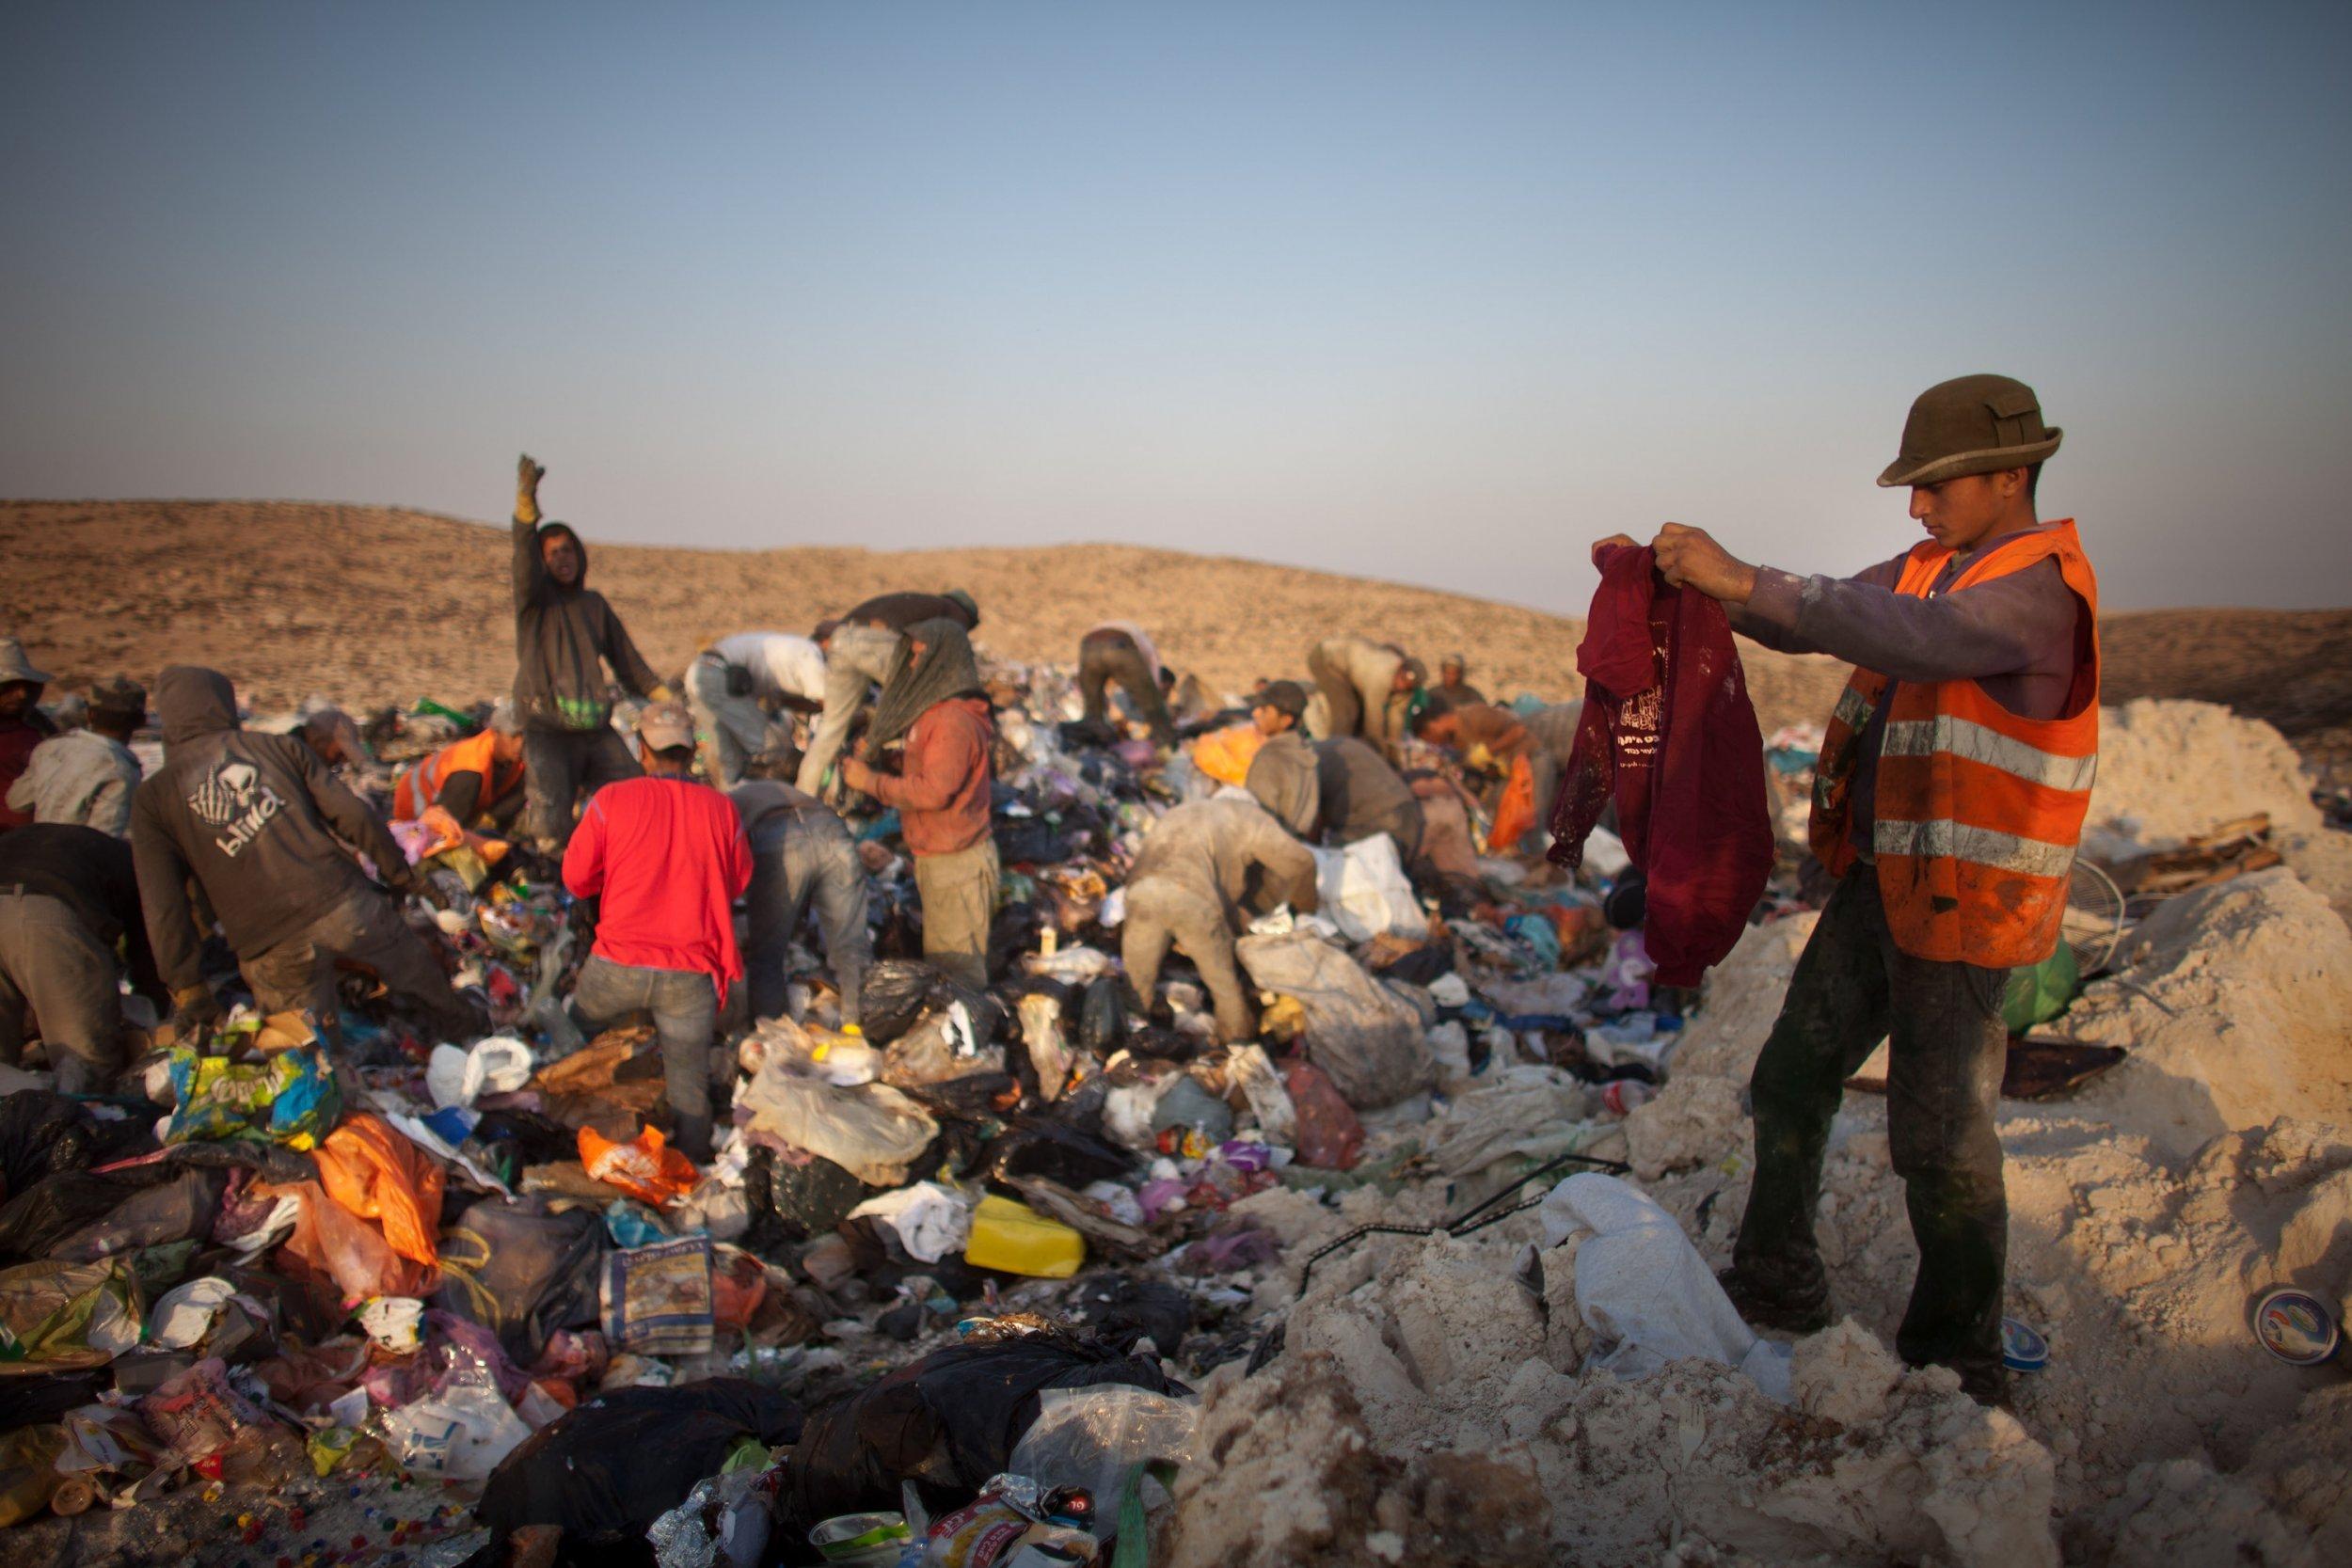 Fast Fashion Is Creating an Environmental Crisis